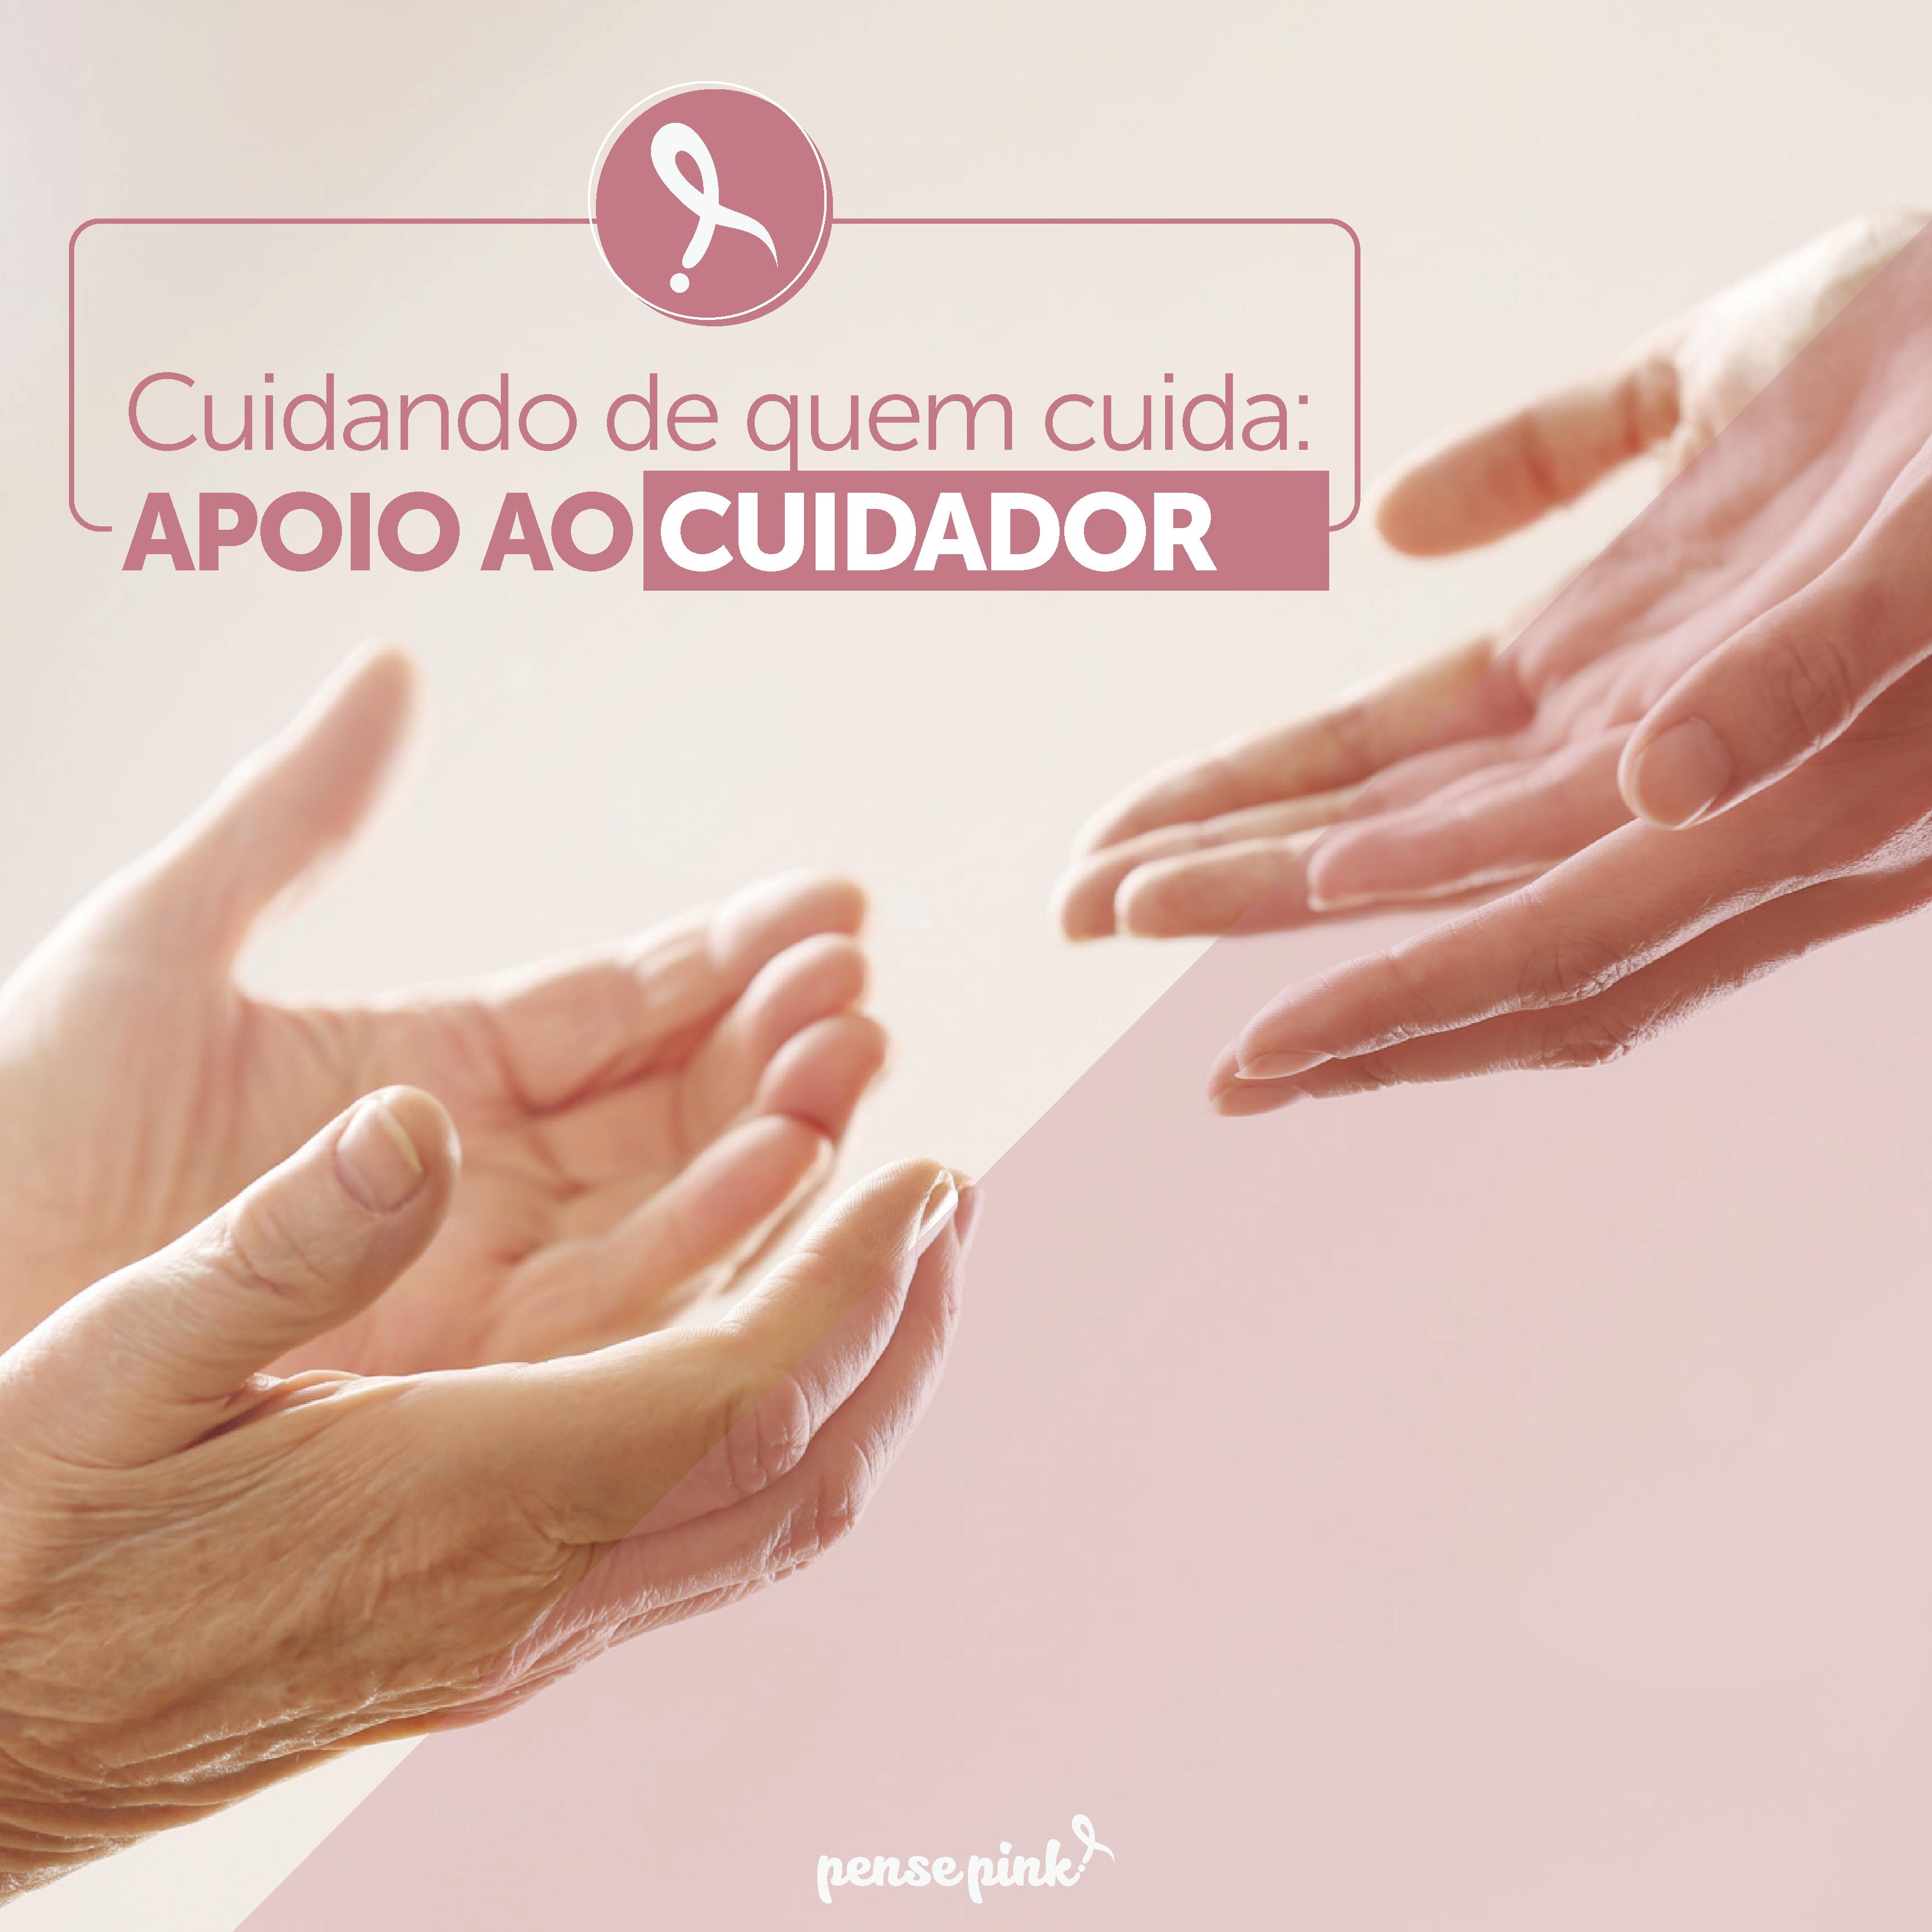 Cuidando de quem cuida: o apoio ao cuidador